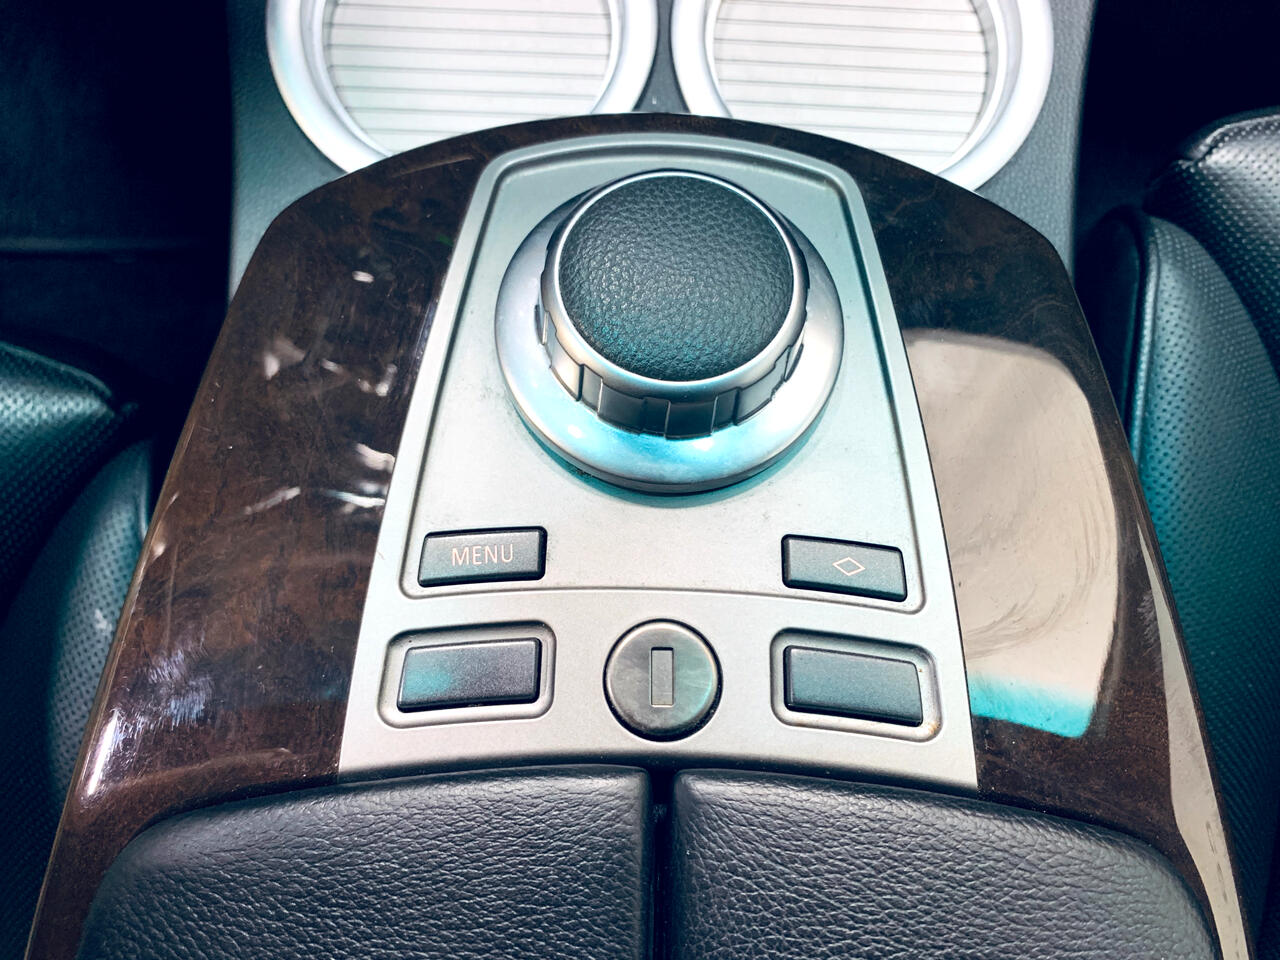 BMW 7 Series 4dr Sdn ALPINA B7 2007